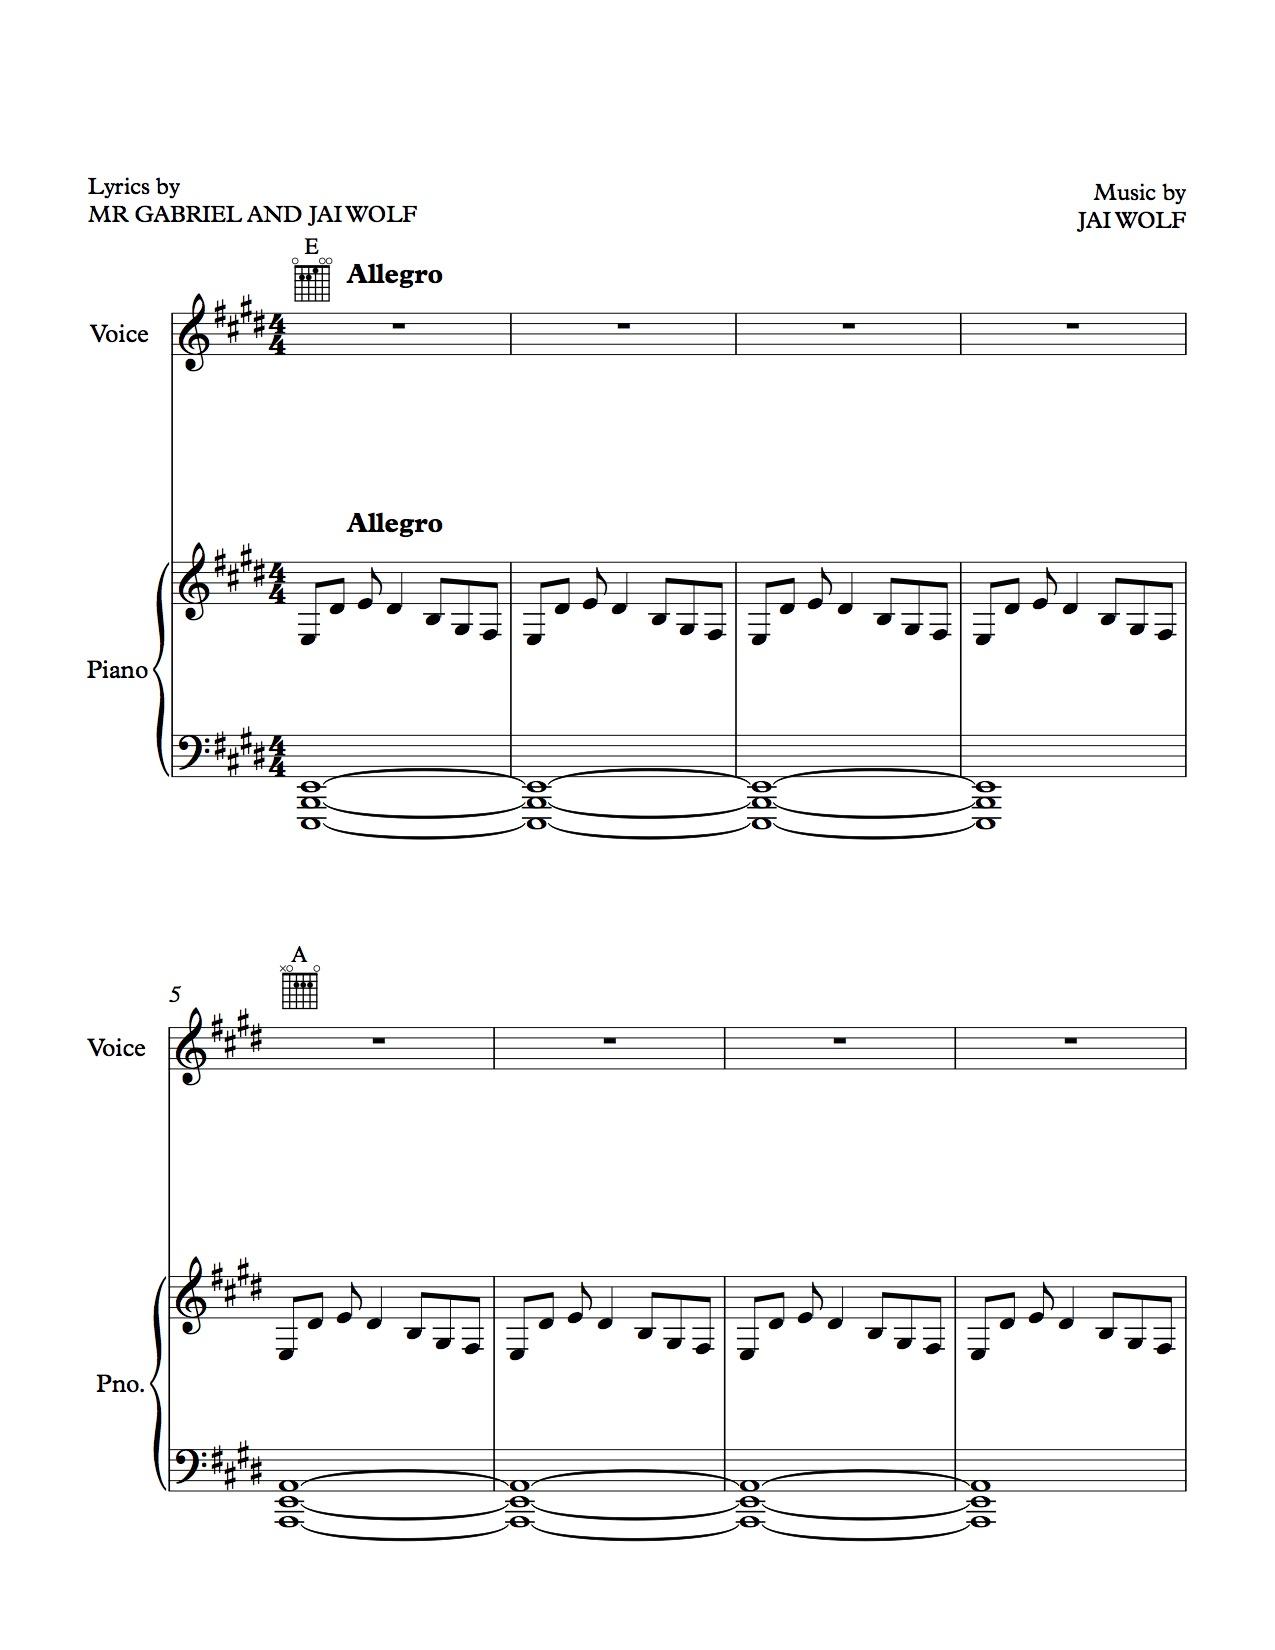 Starlight Score (lyrics revised).jpg